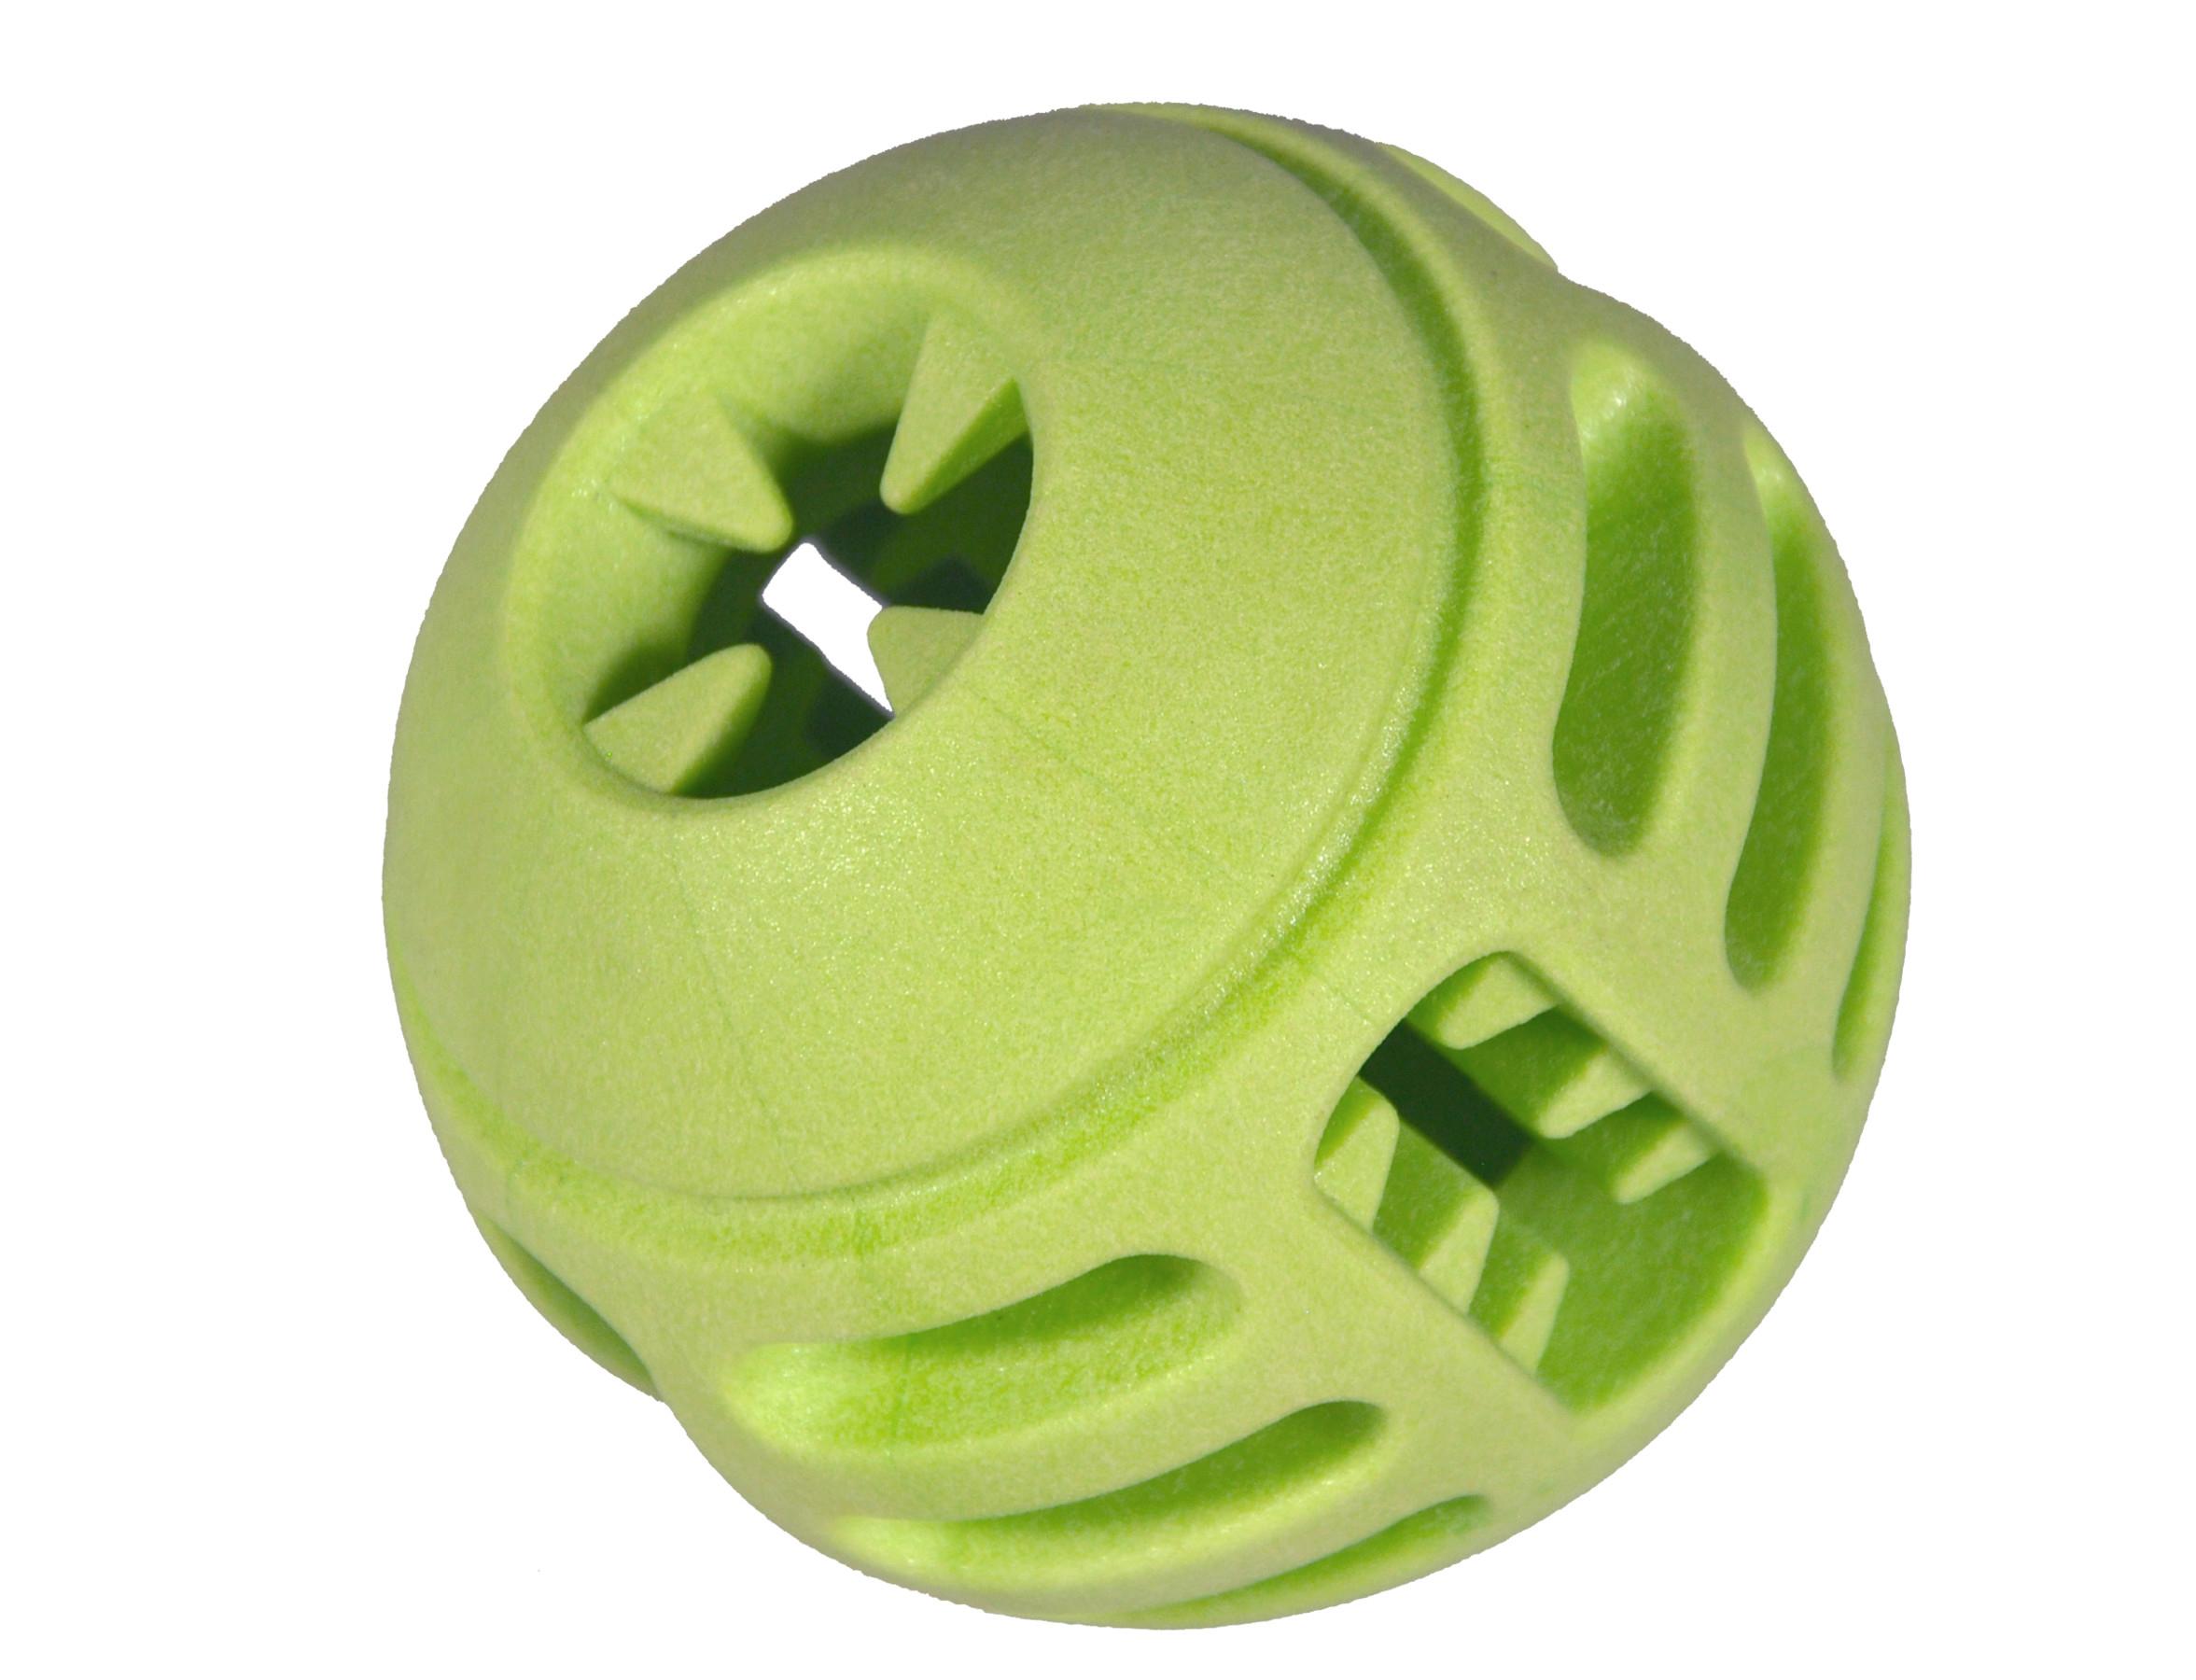 VDG TPR Aplle Green Ball kamuoliukas šuniui 8cm